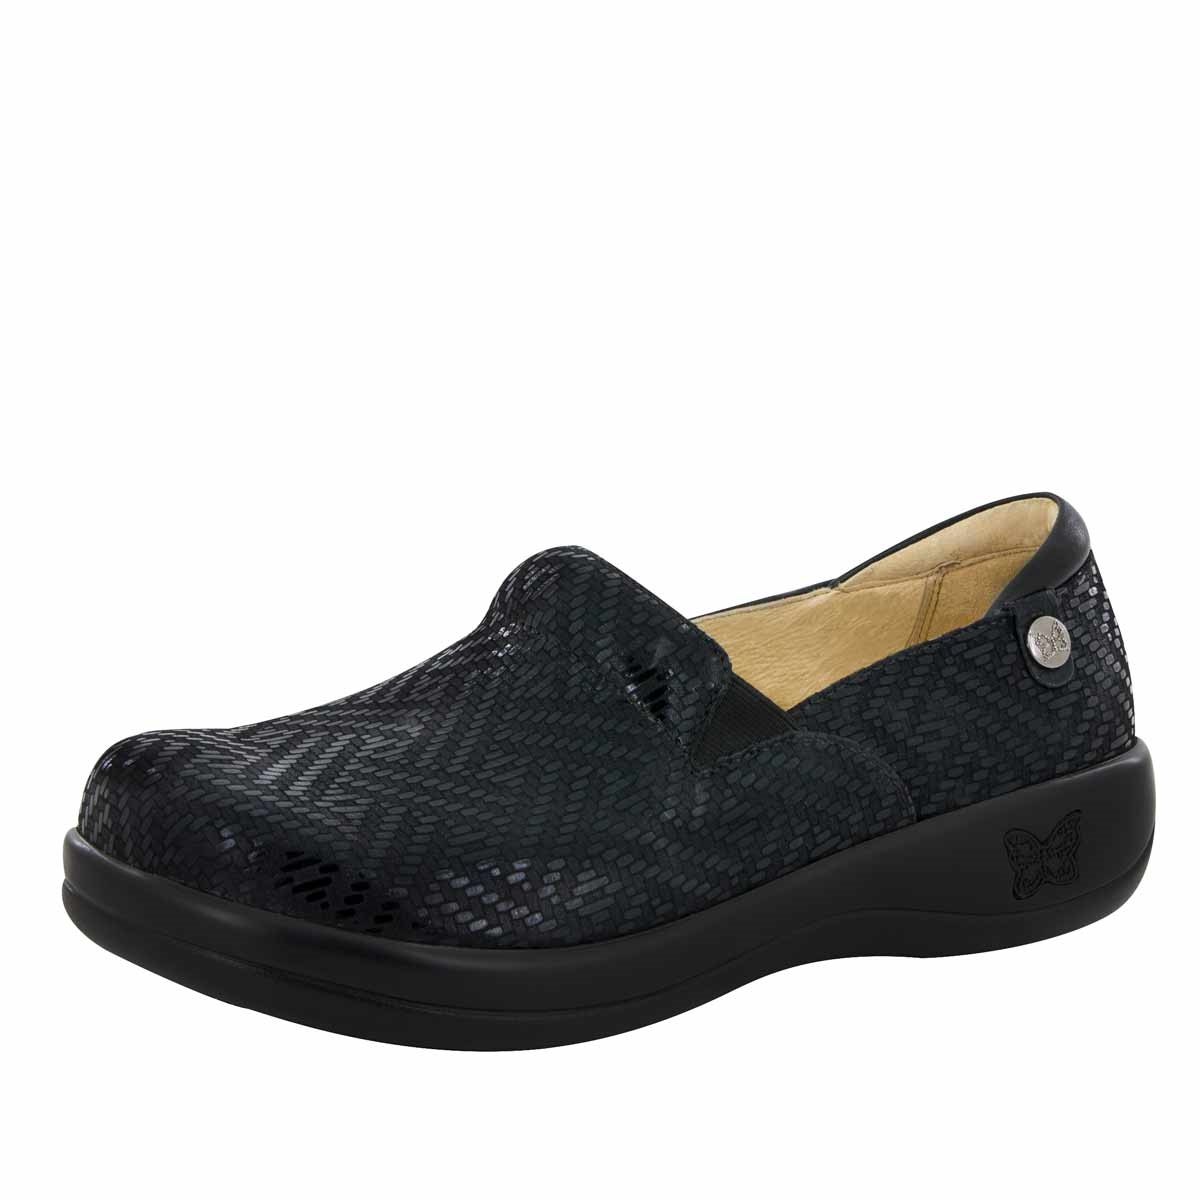 Ebay Alegria Keli Nurses Non Slip Shoes Size